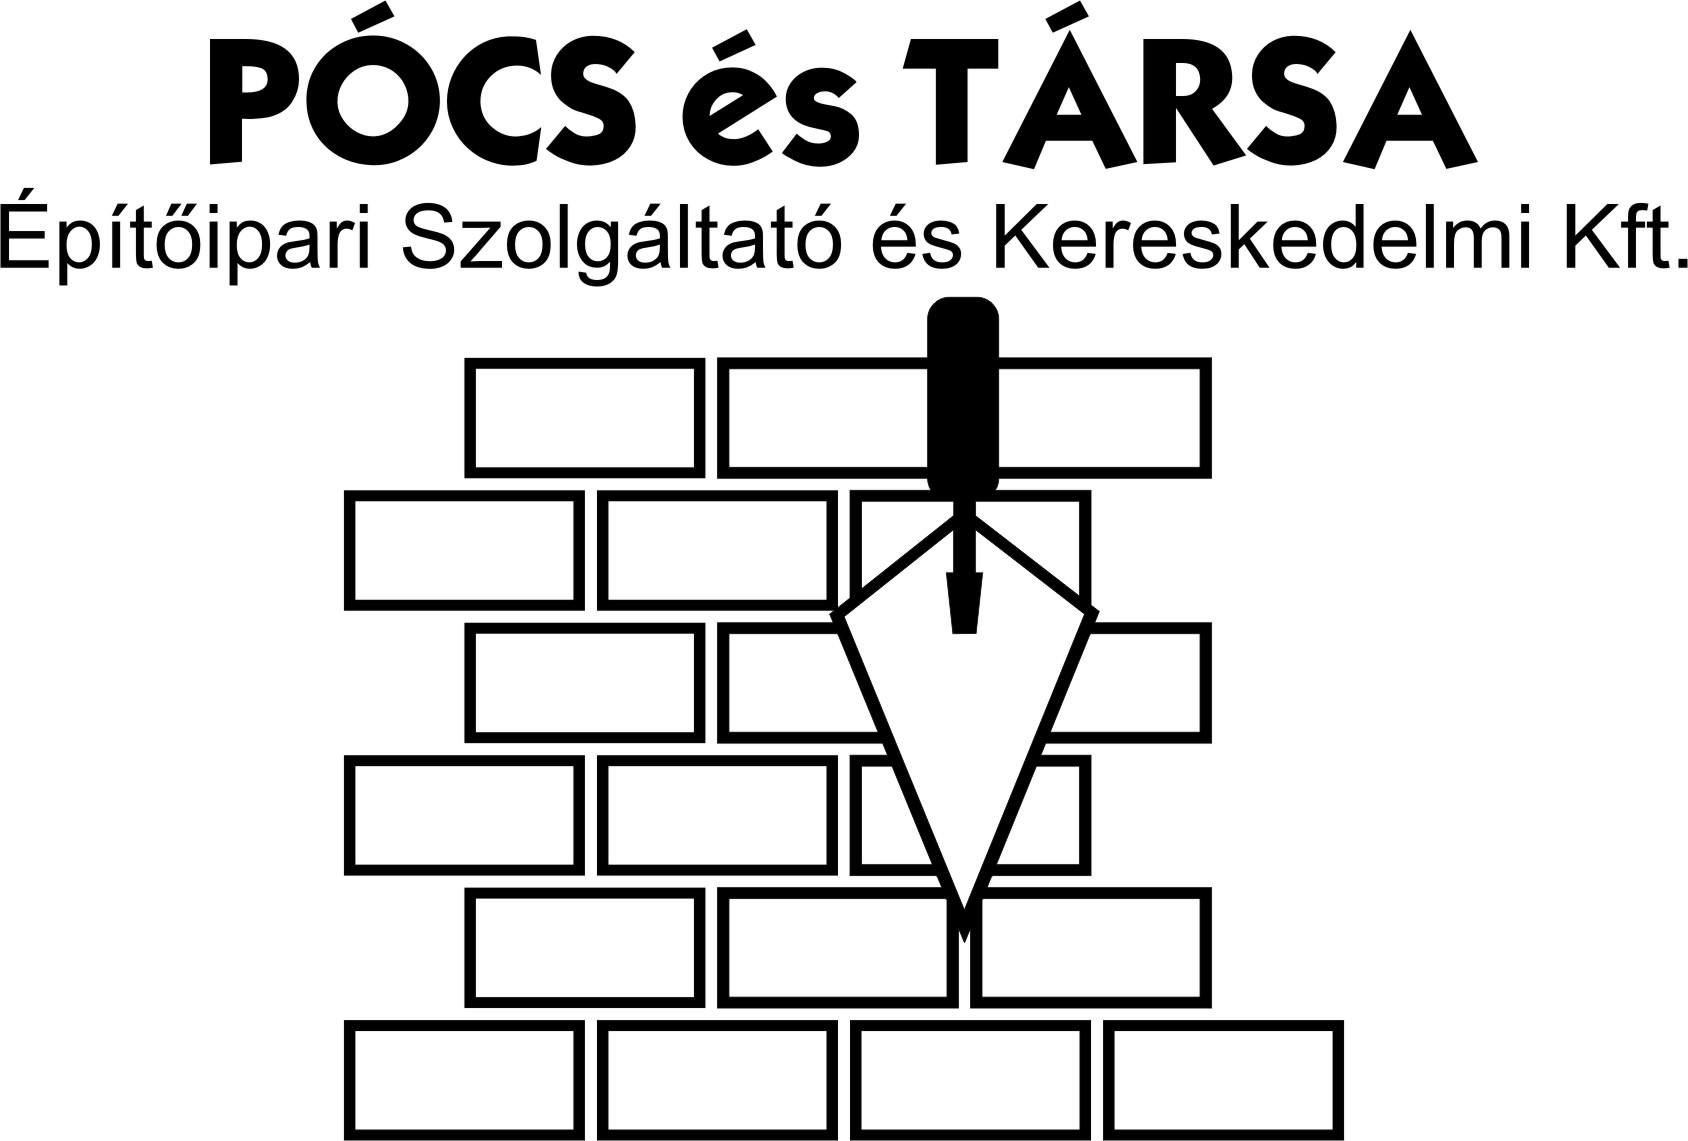 POCS_ES_TARSA_LOGO